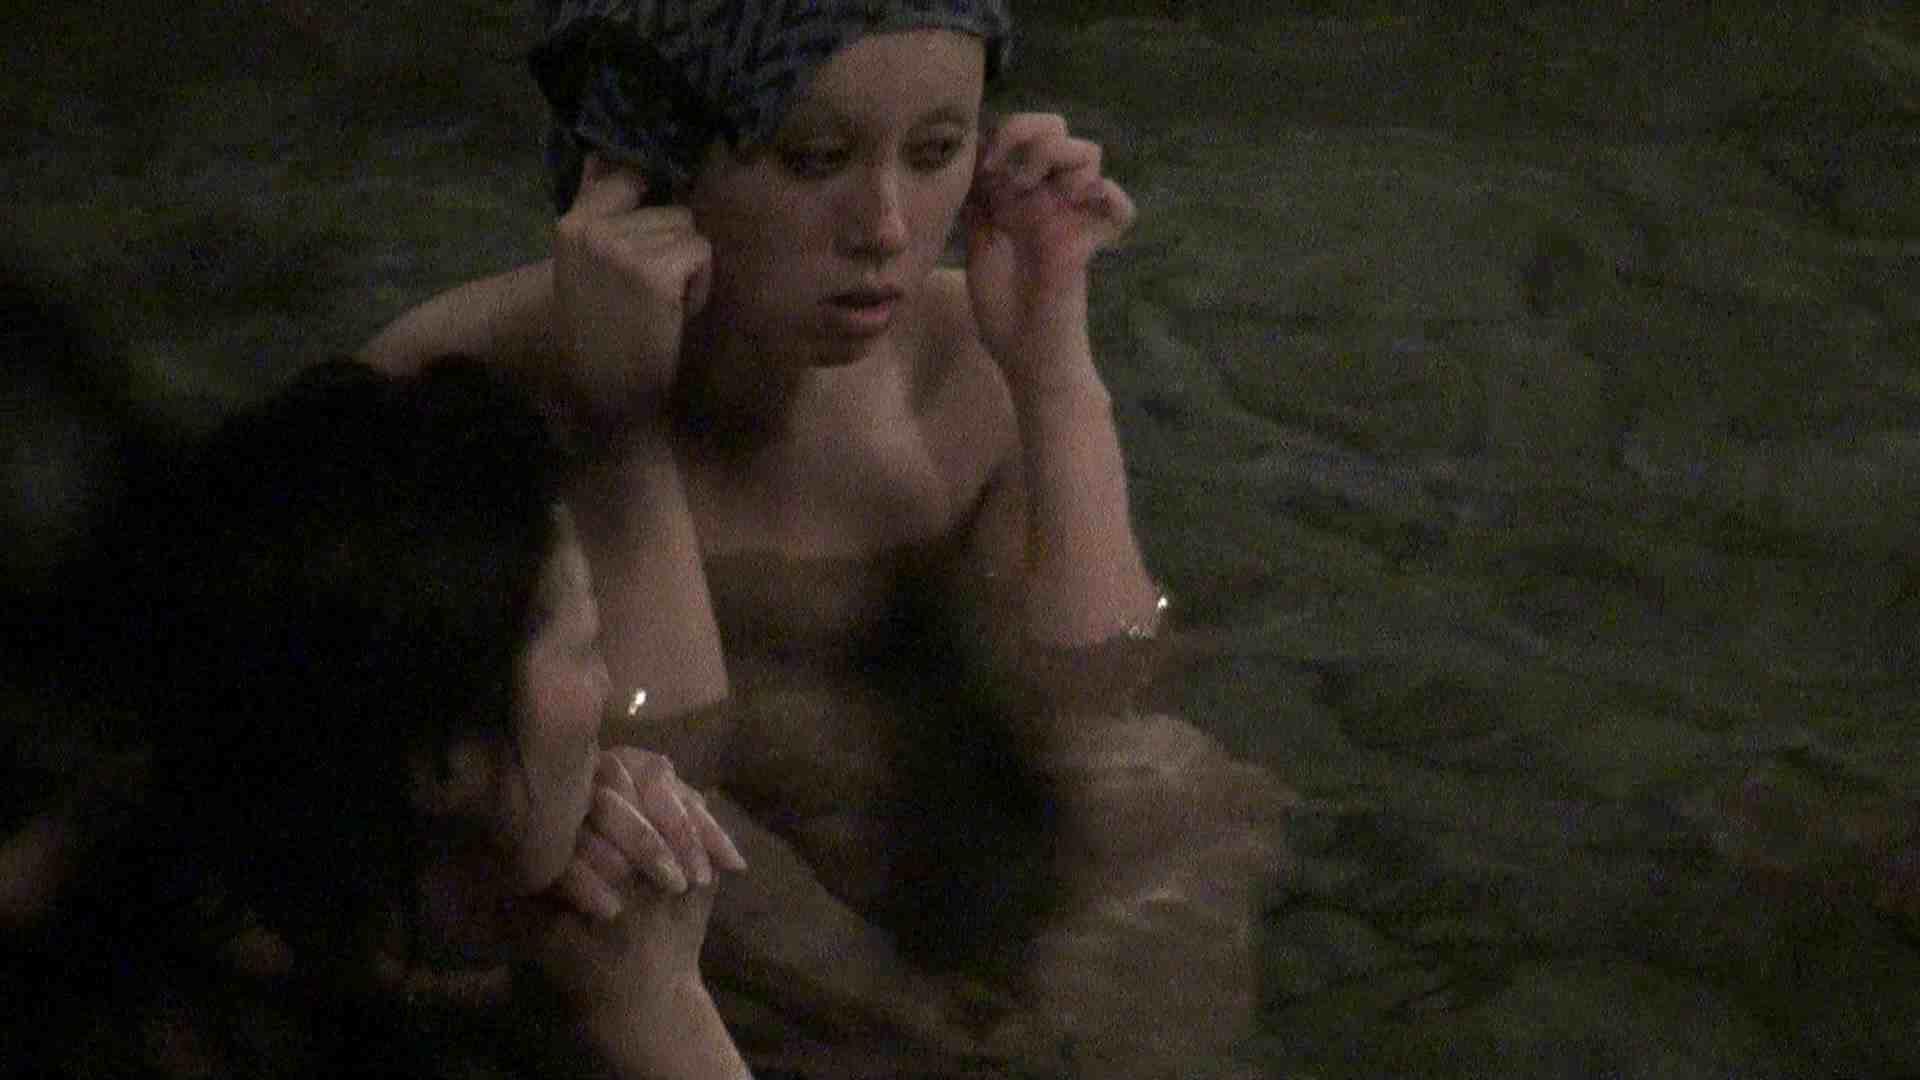 Aquaな露天風呂Vol.367 盗撮 | HなOL  96pic 74